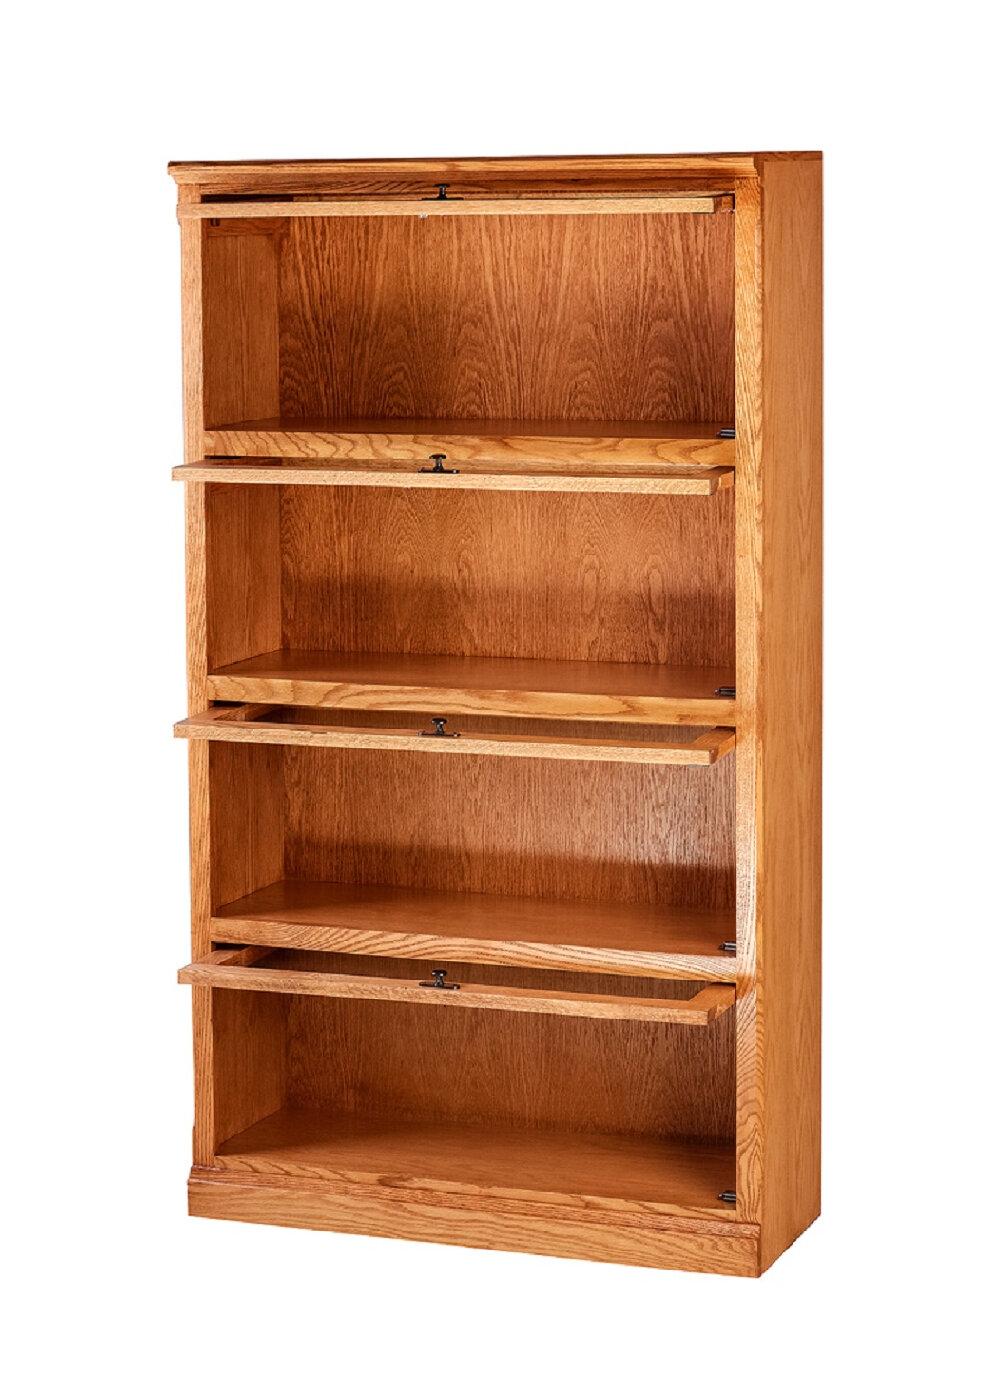 Lassiter Barrister Bookcase